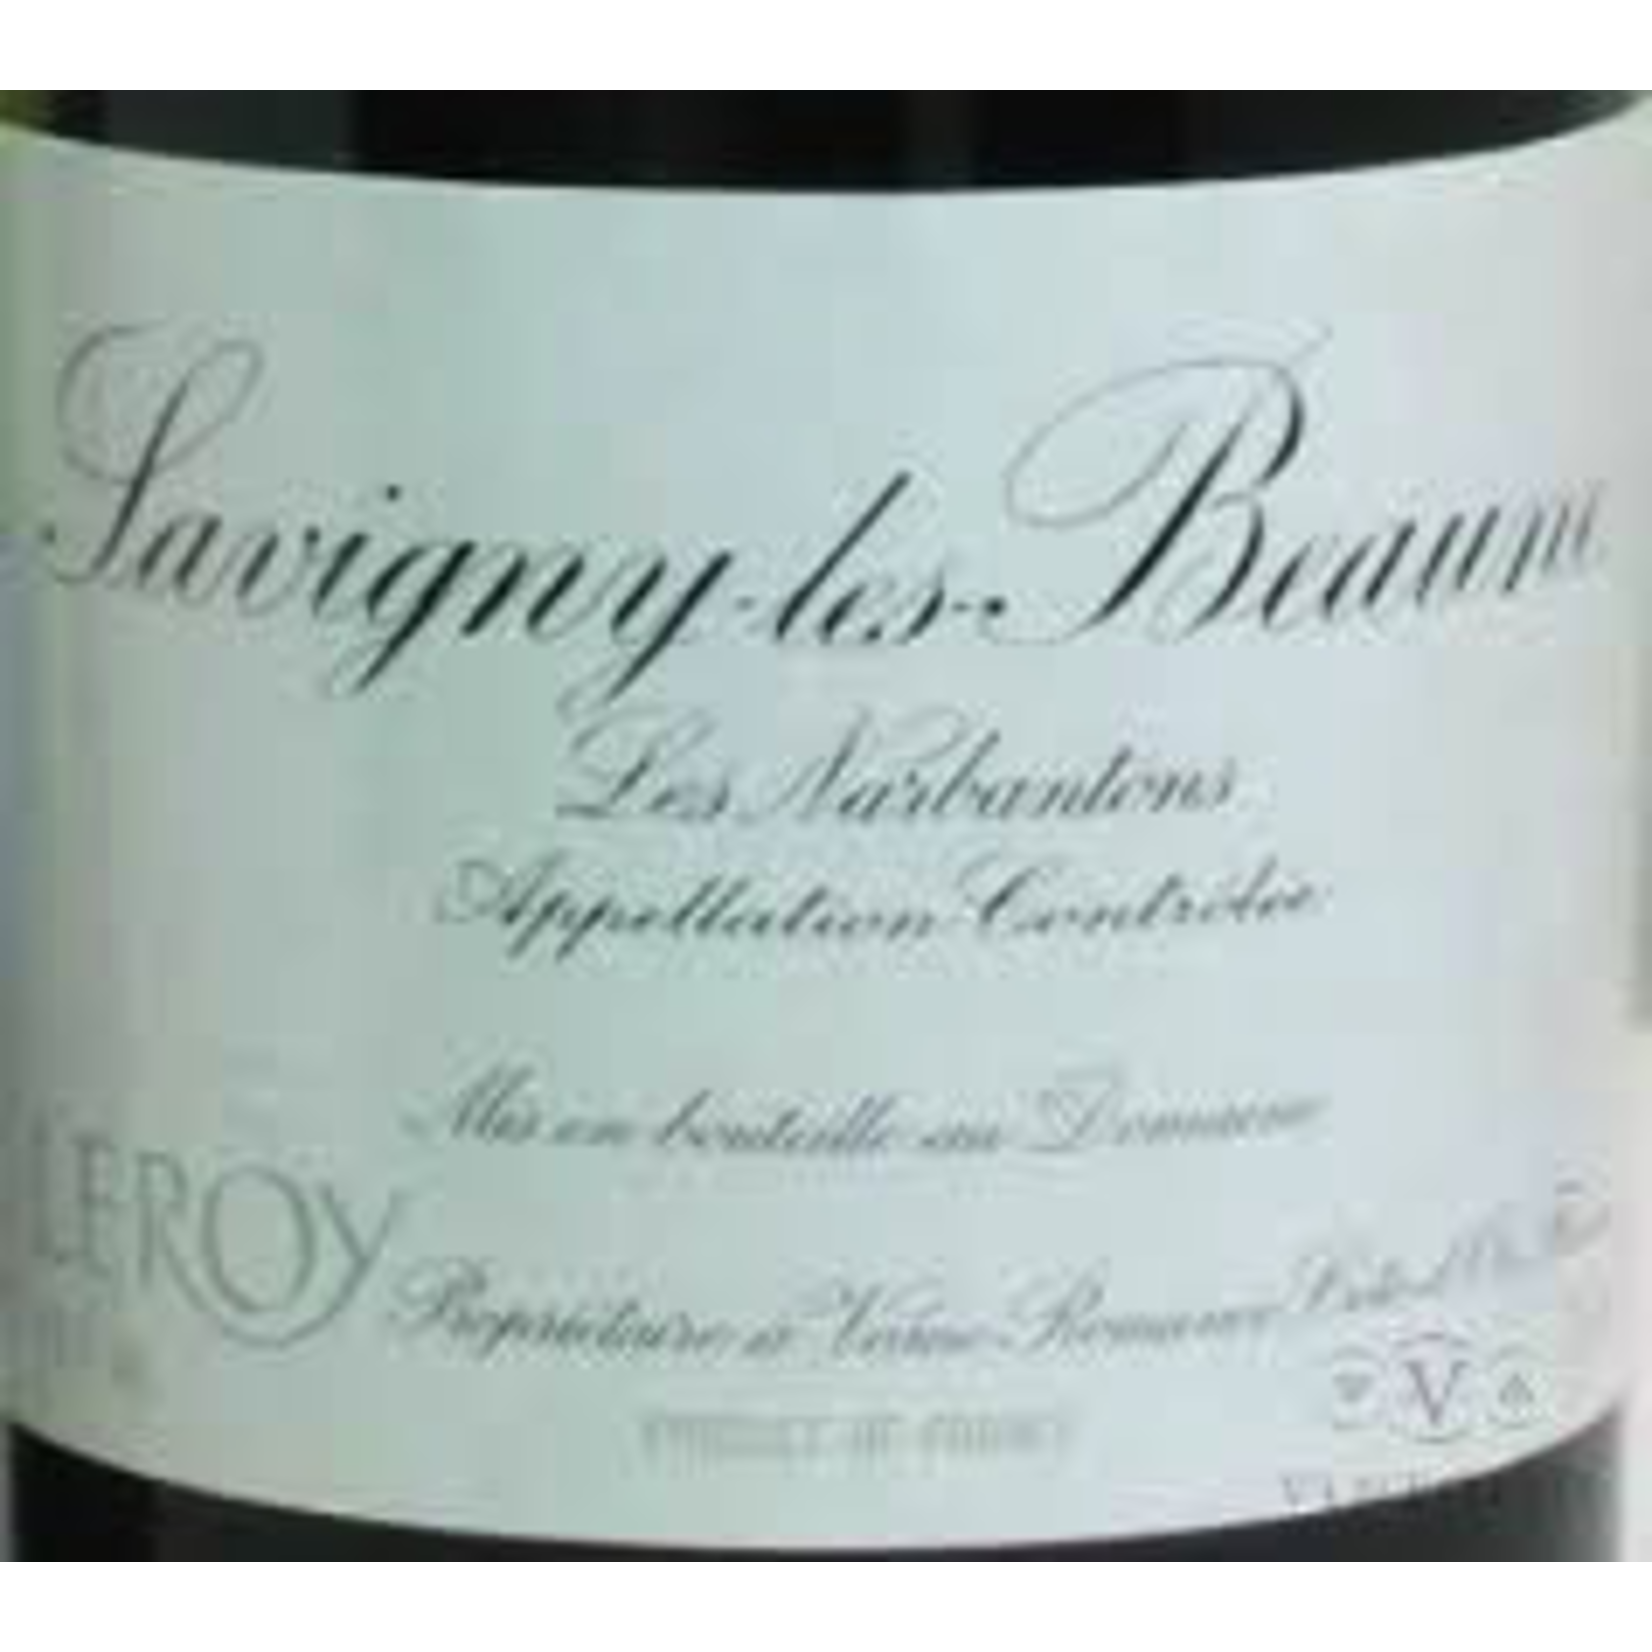 Wine Domaine Leroy Savigny Les Beaune Les Narbanton Premier Cru 1978